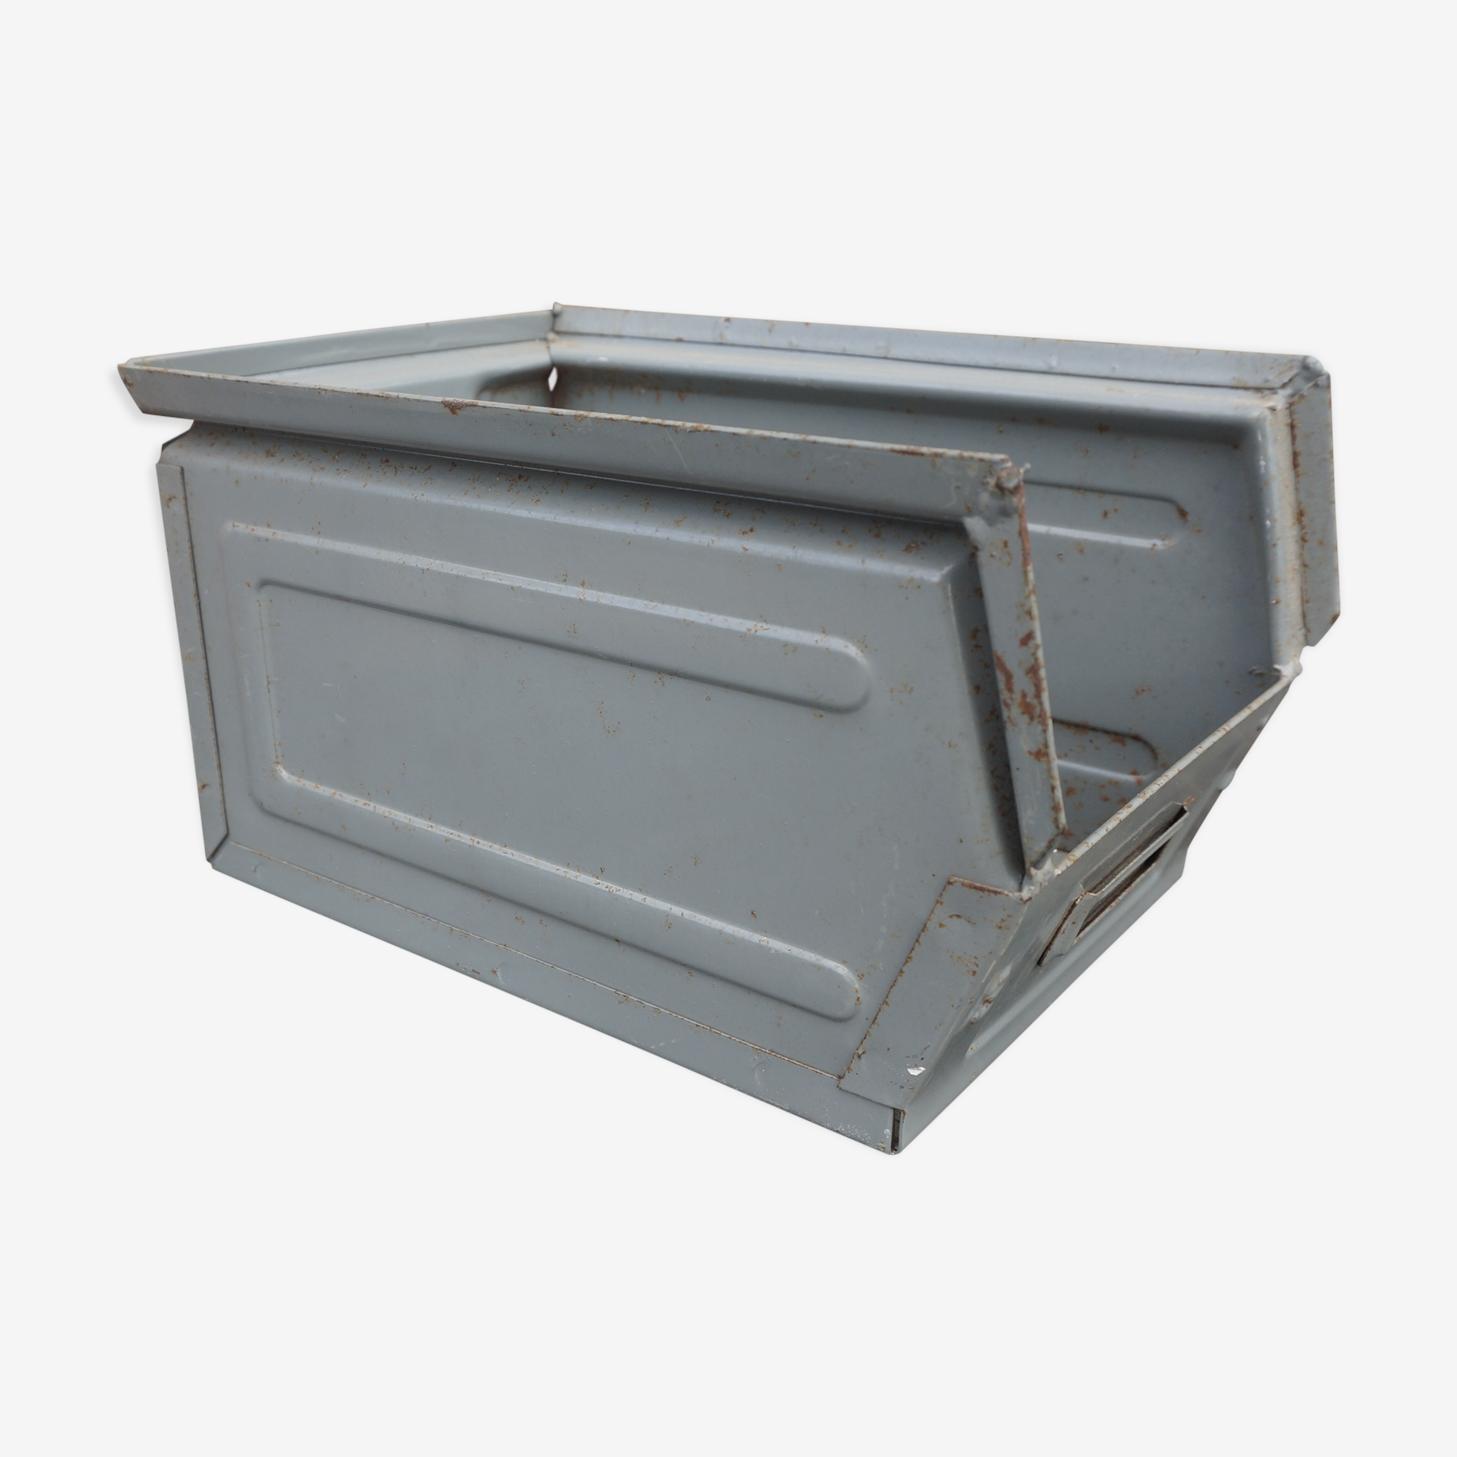 Small box metal